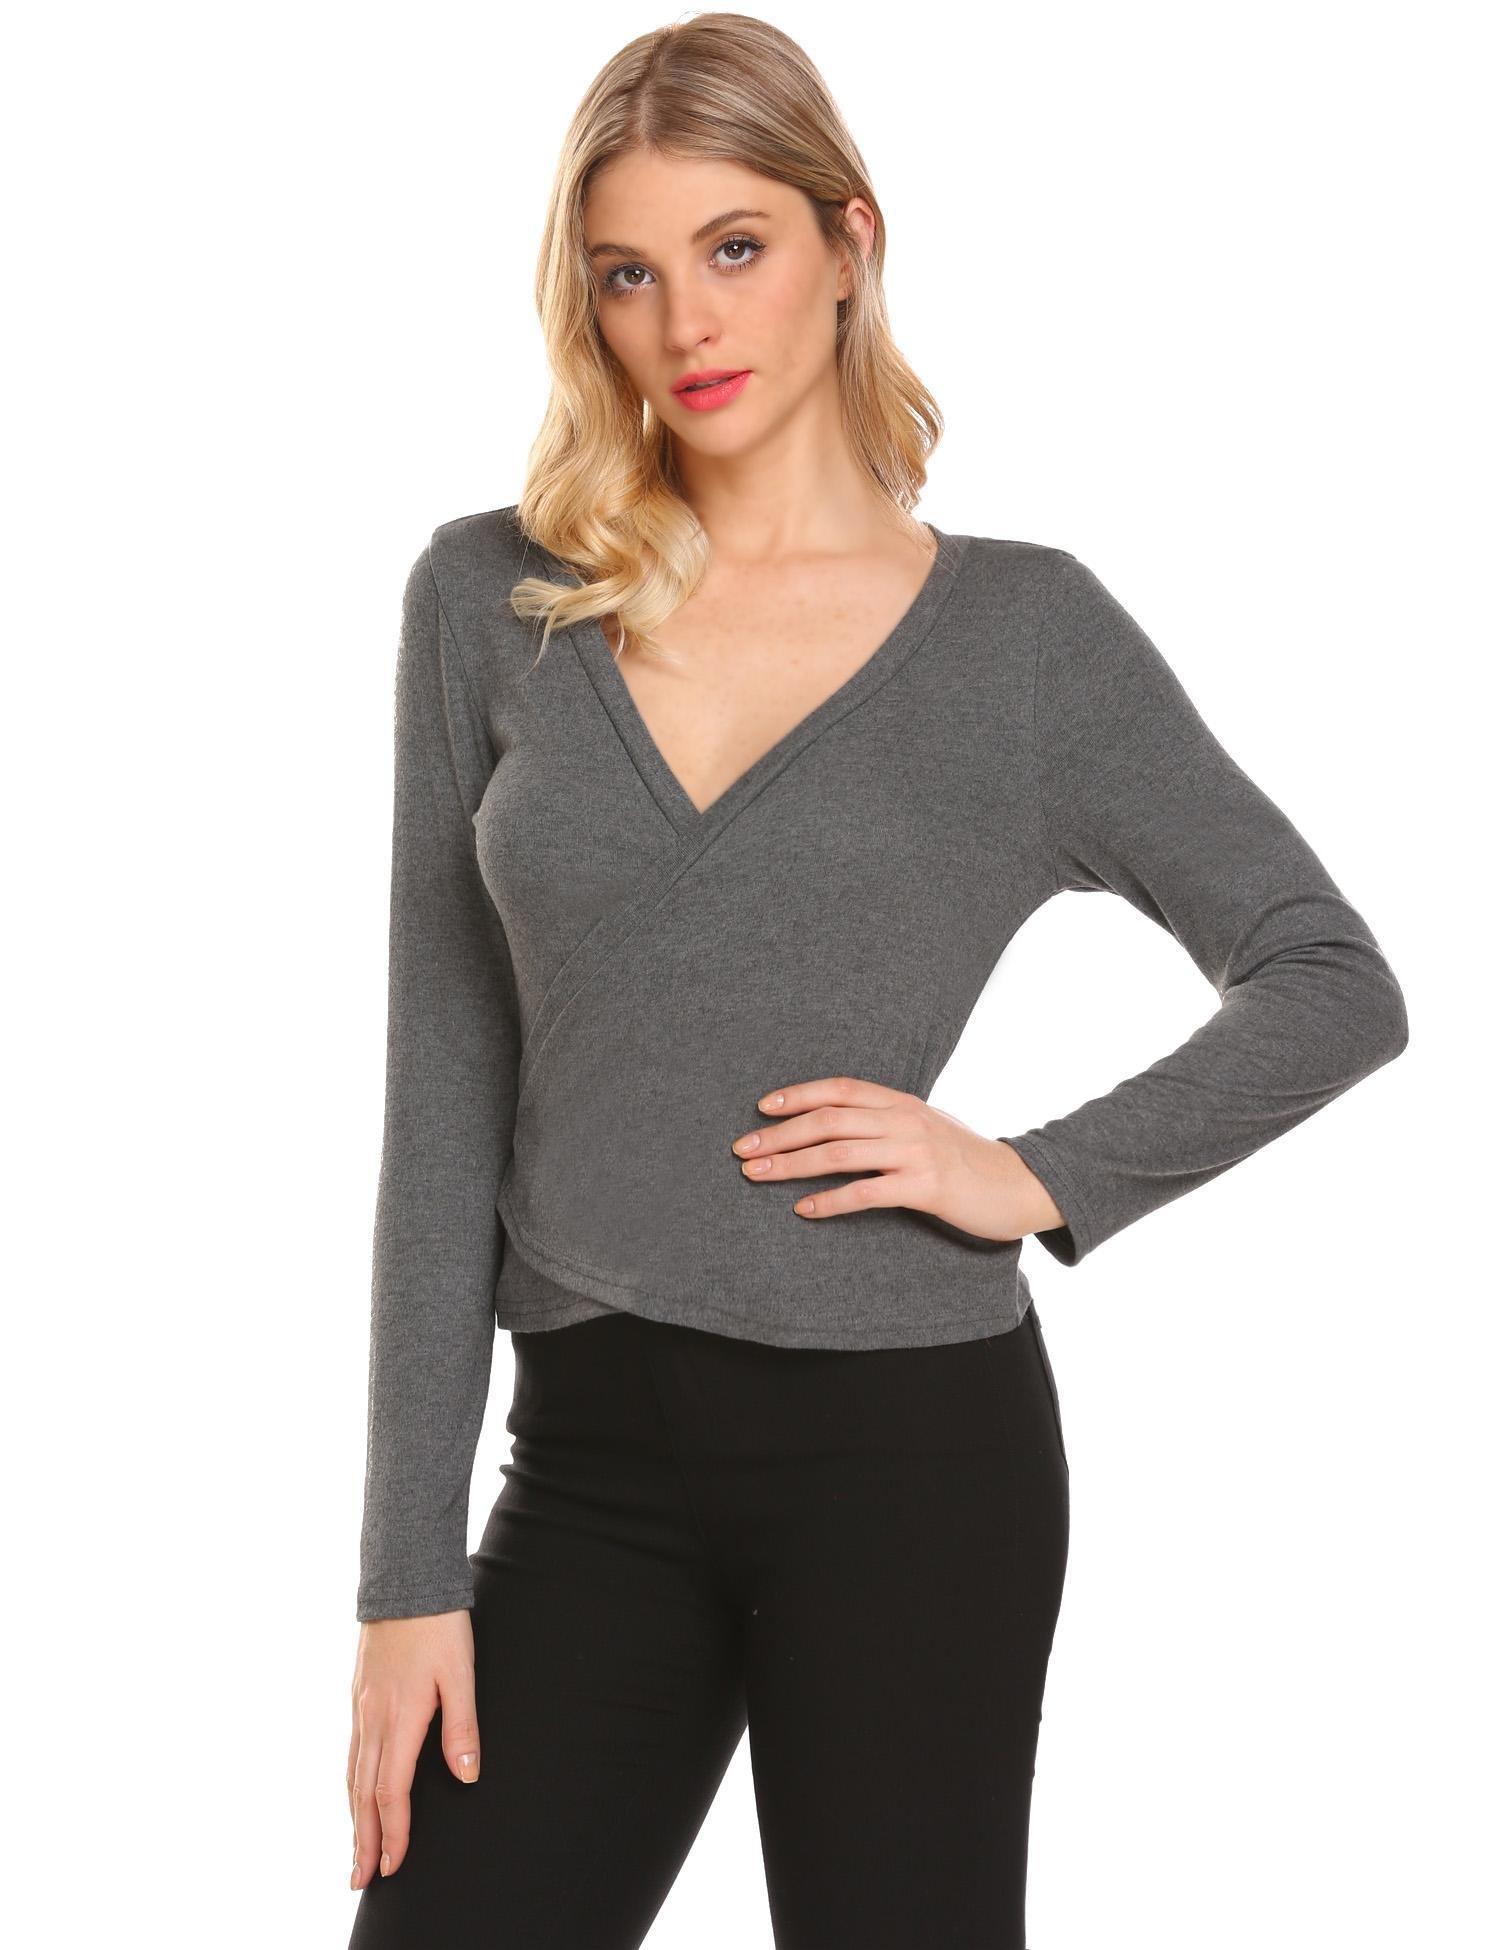 Grabsa Women Long Sleeves Knit Surplice Wrap Top For Leggings Gray XL